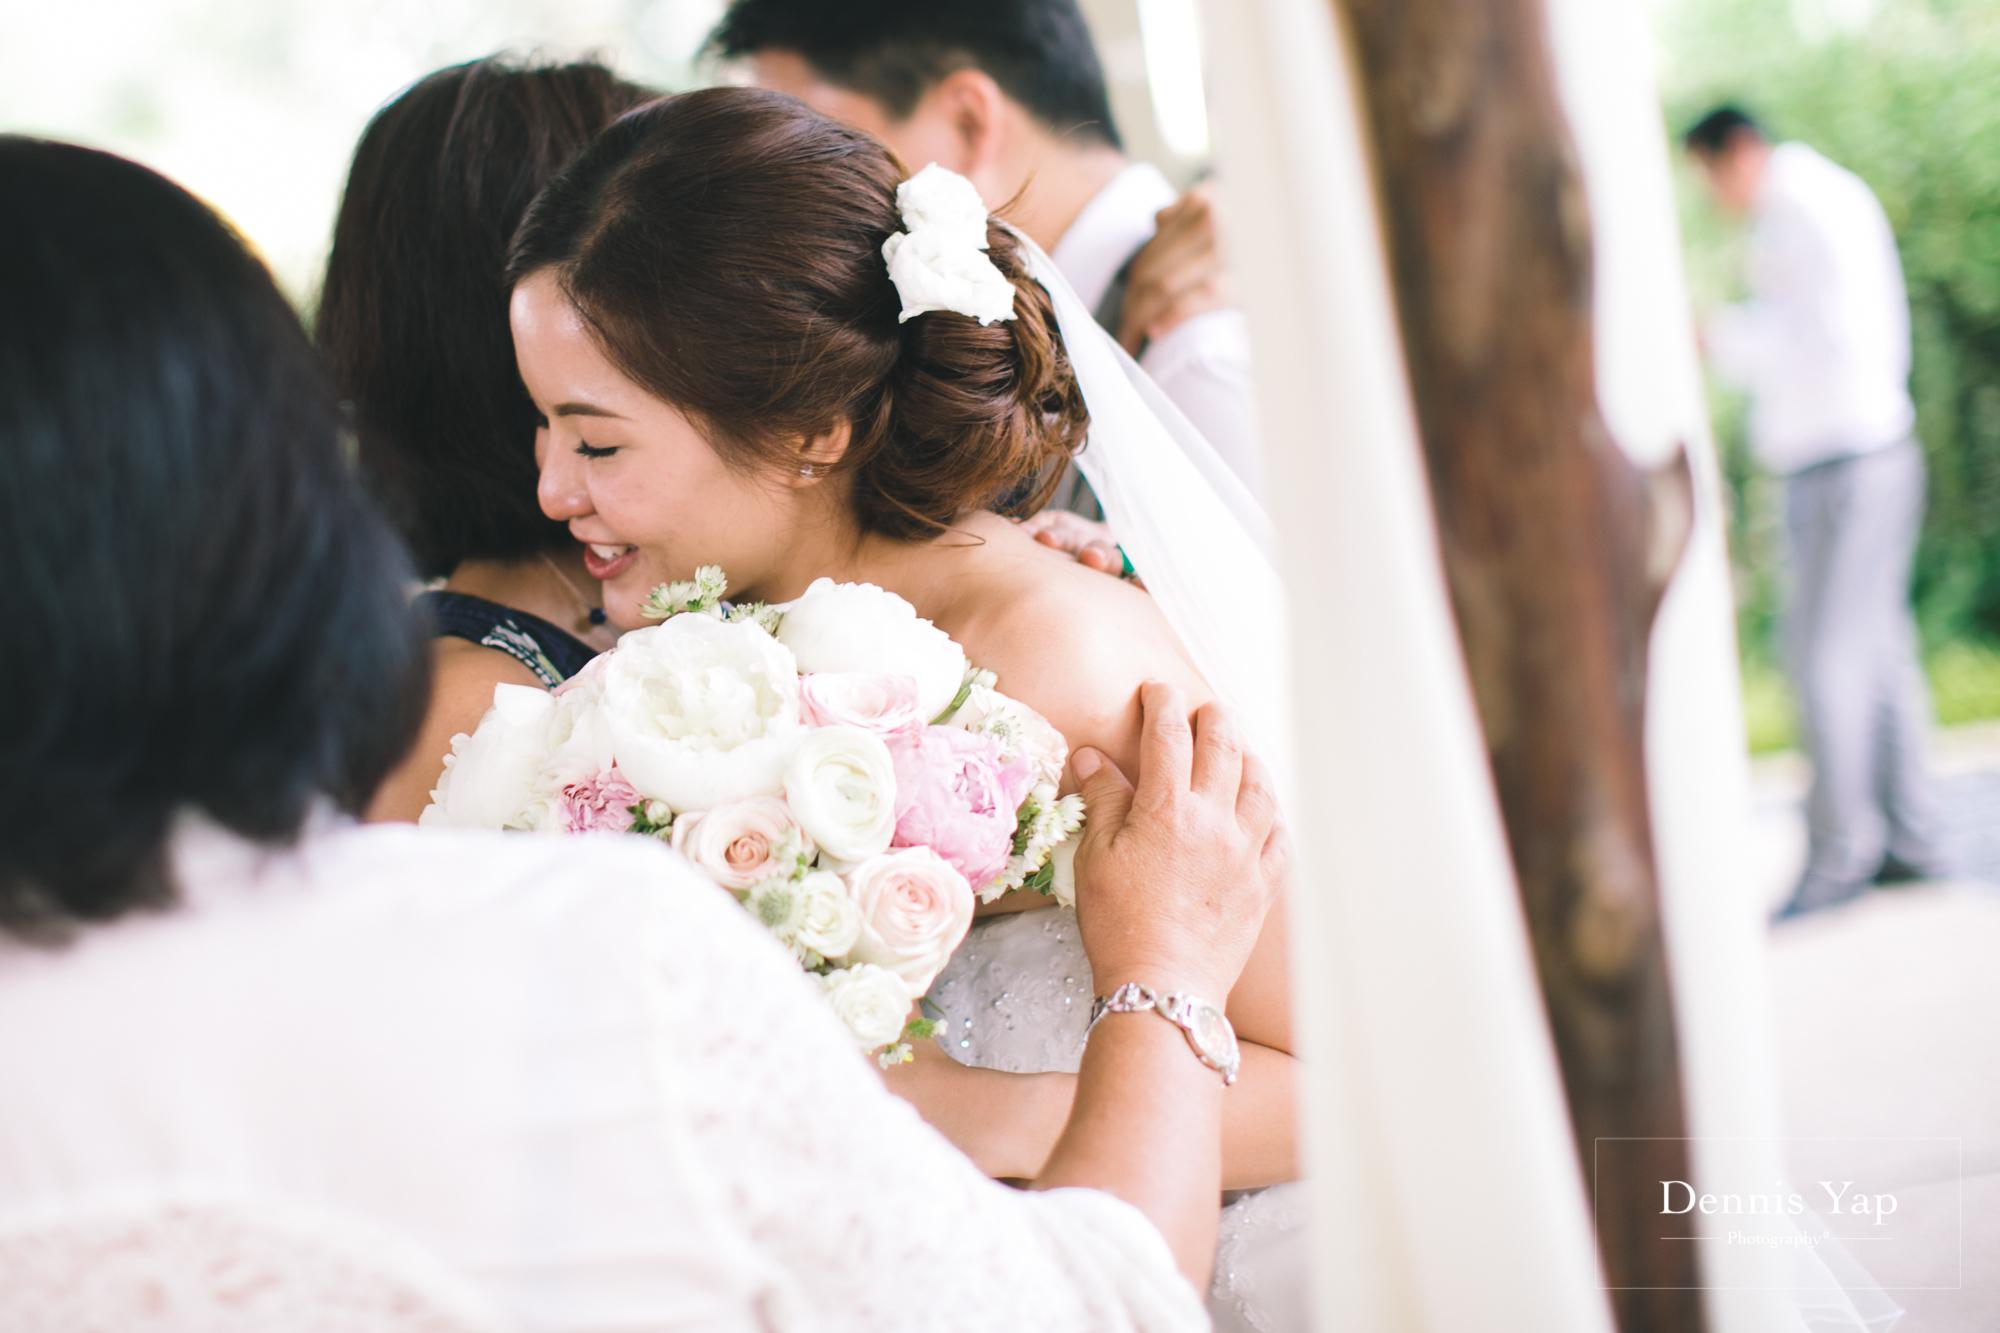 chin foo sze yin wedding day botanic klang club house dennis yap photography-28.jpg